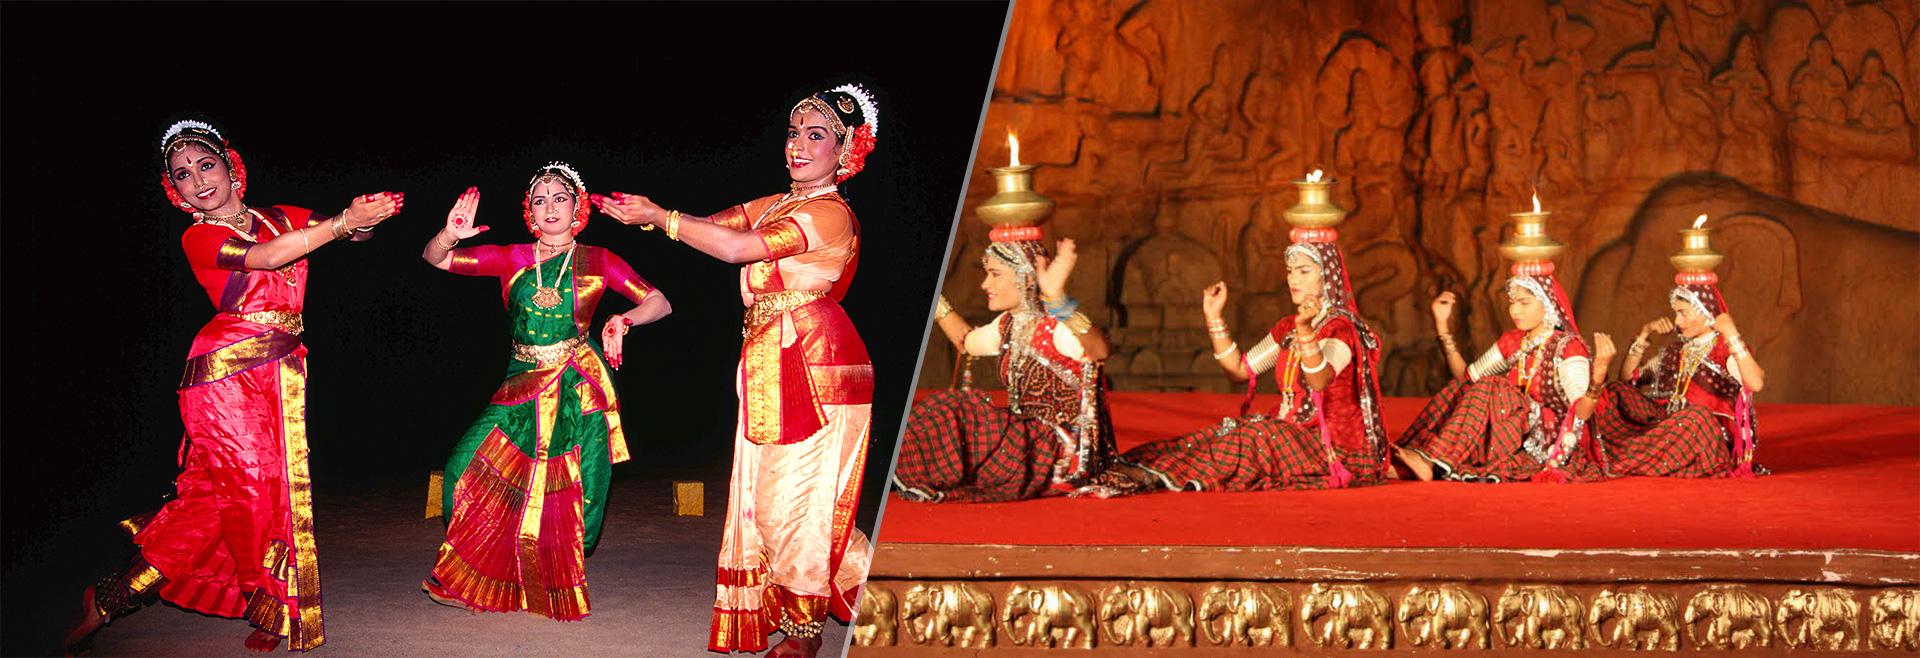 Mamallapuram Dance Festival 2017